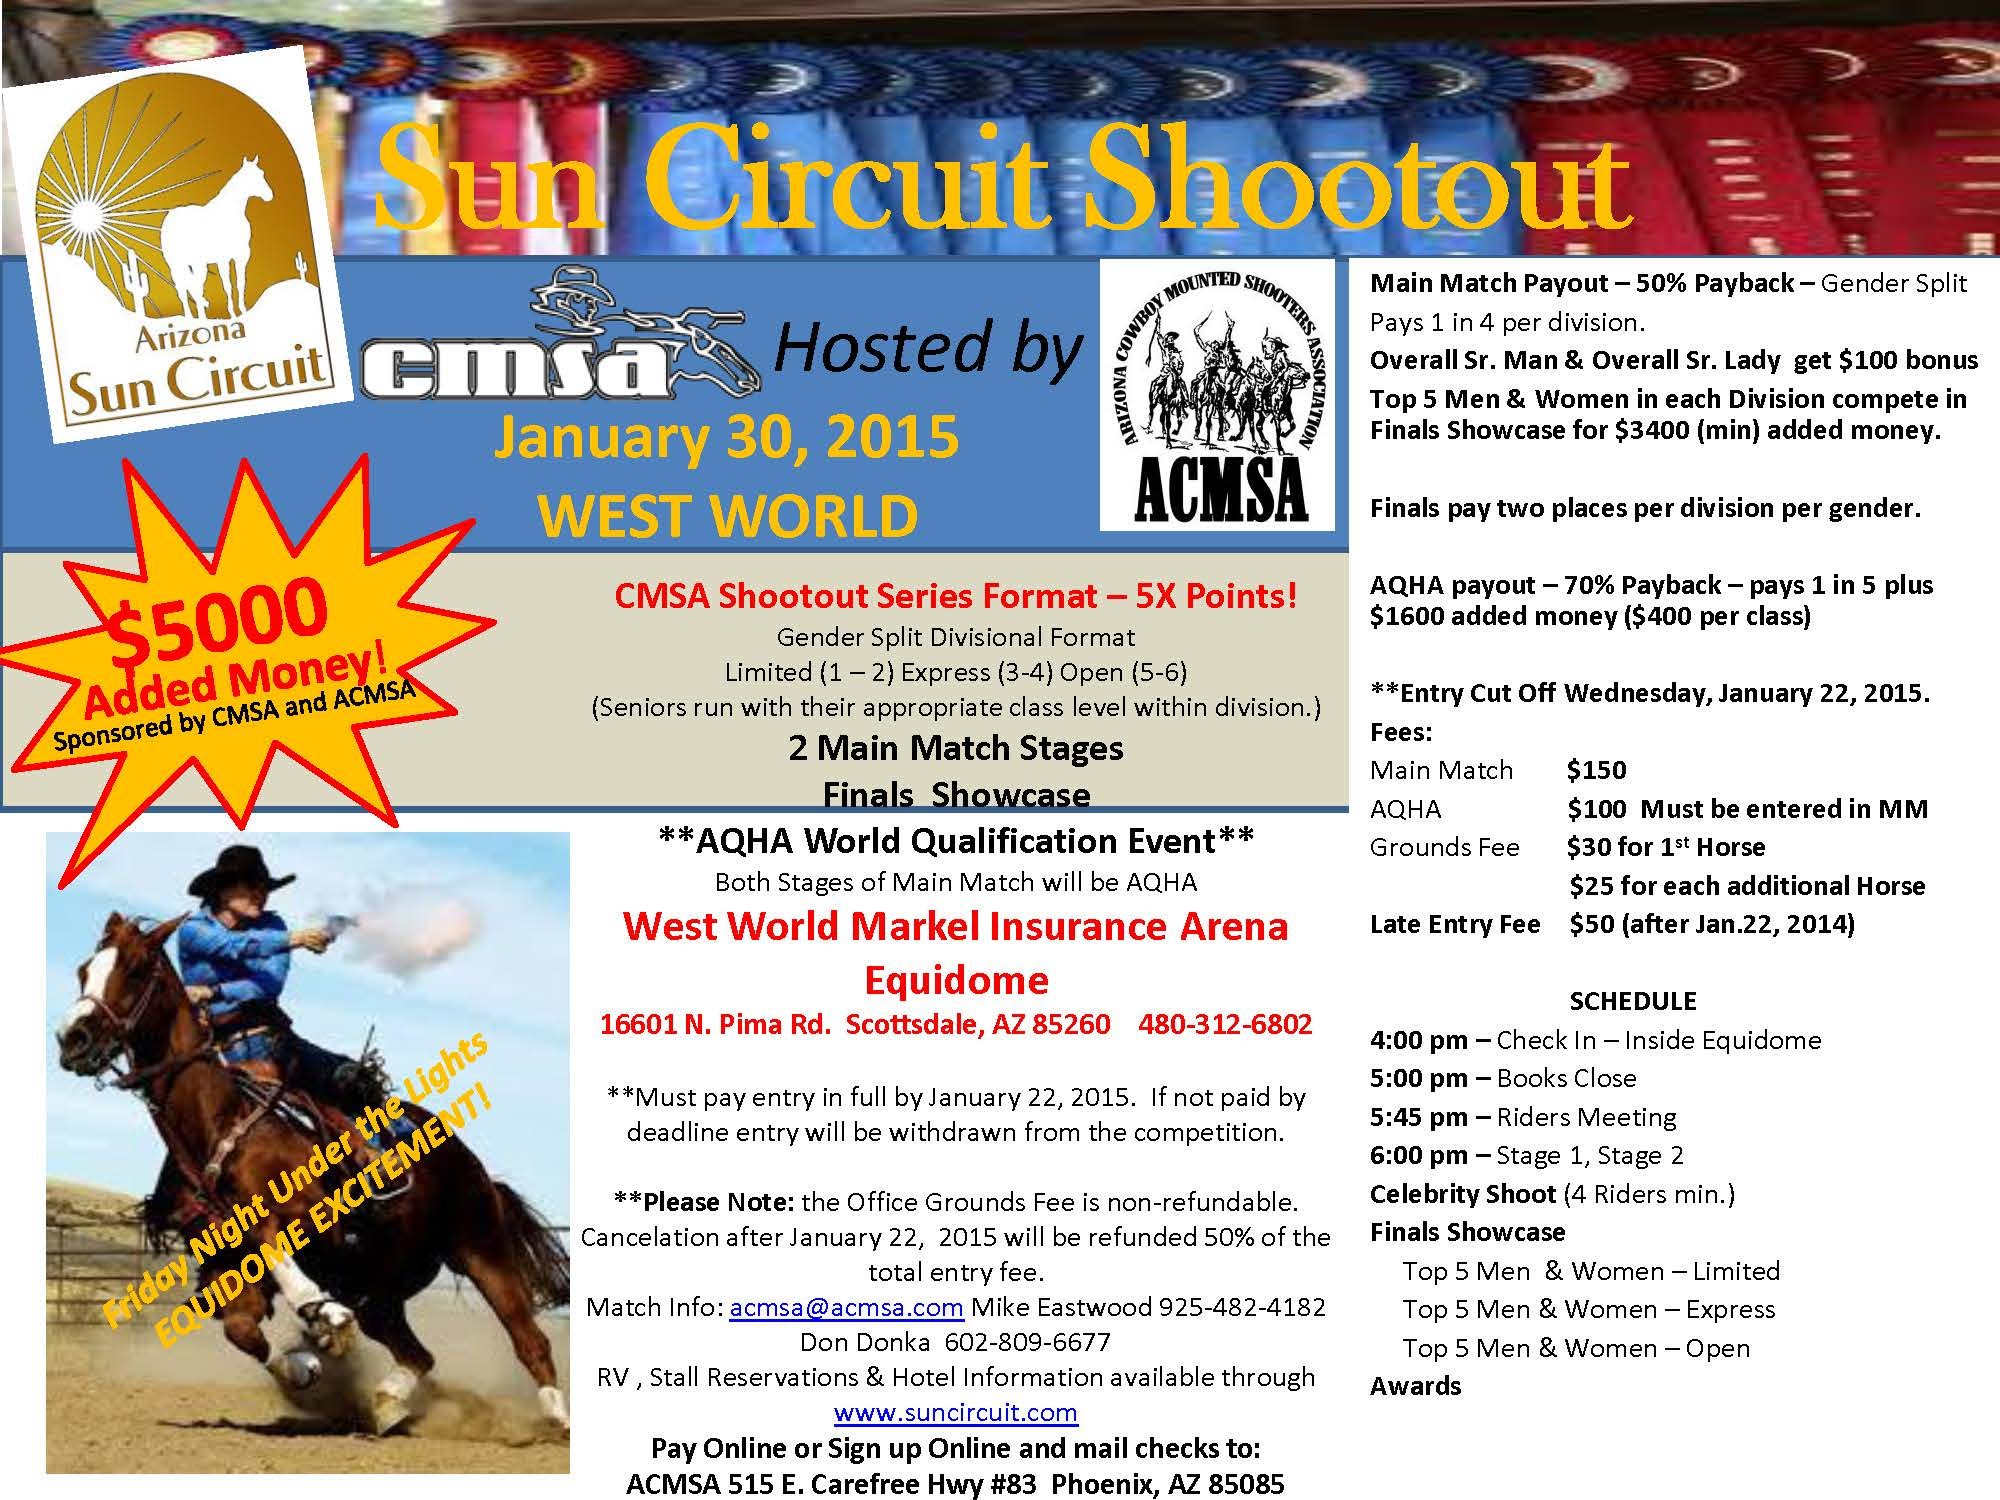 CMSA Sun Circuit Shootout